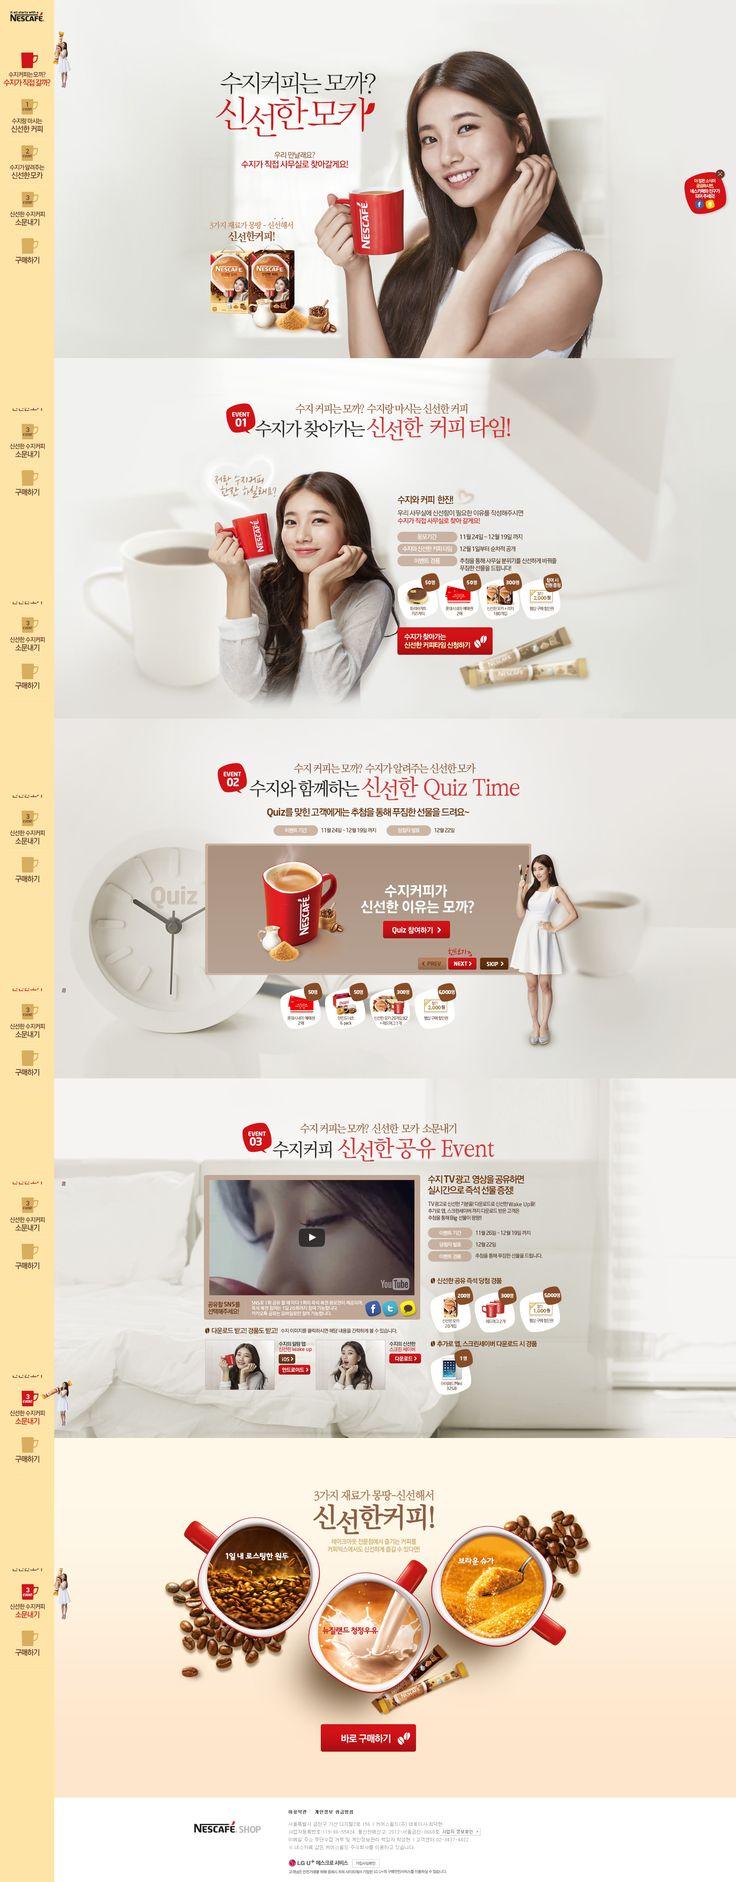 nescafe website / 네스카페 웹사이트 / 수지 / 커피사이트 / coffeesite / coffee